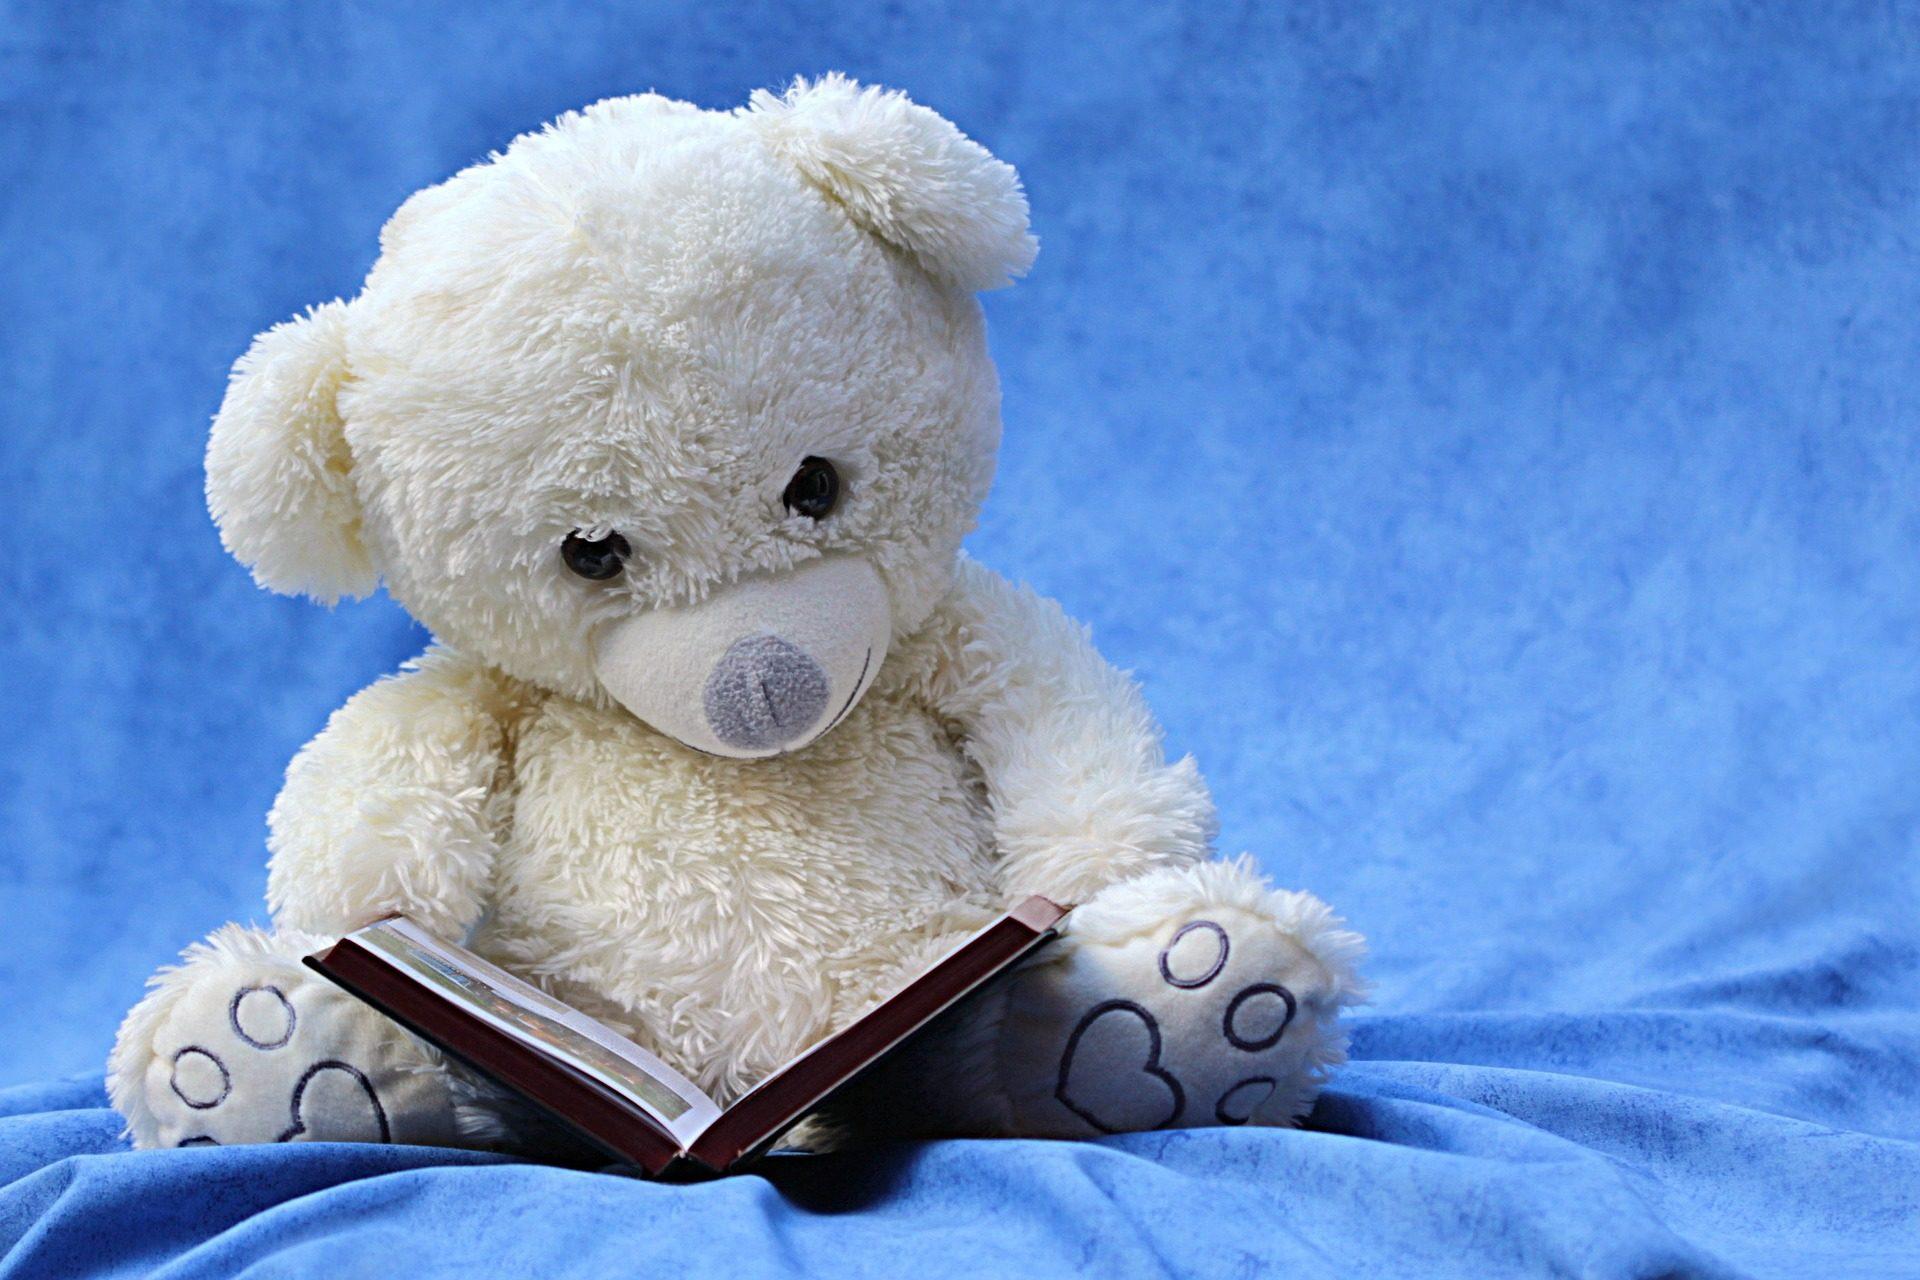 Bär, Teddy, Buch, Lesen, Weiß - Wallpaper HD - Prof.-falken.com